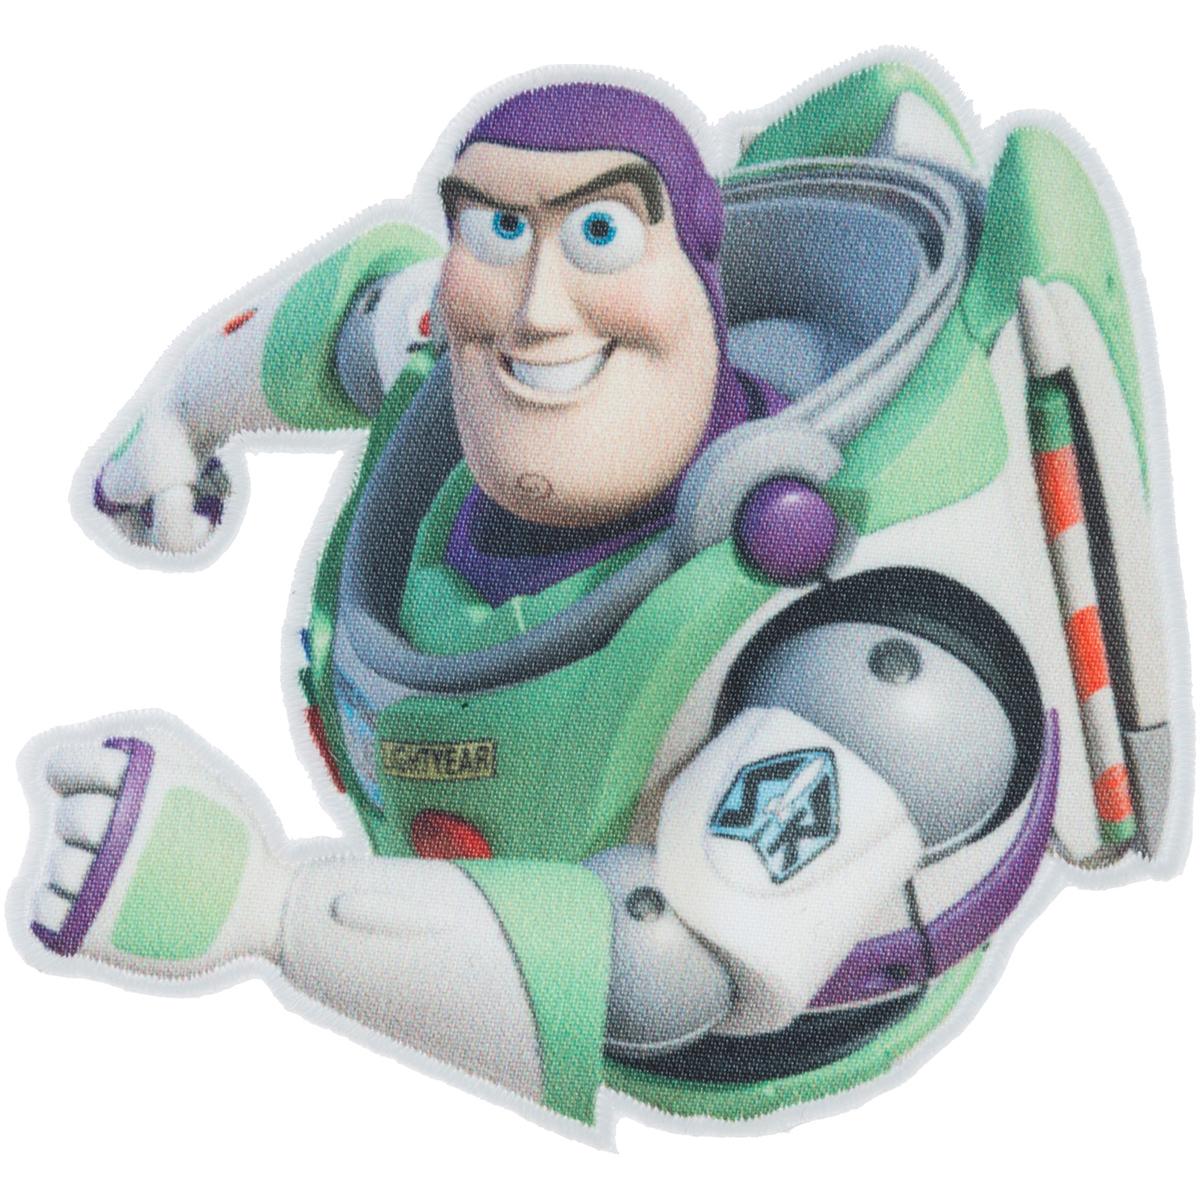 Disney Toy Story Iron-On Applique, Buzz Lightyear